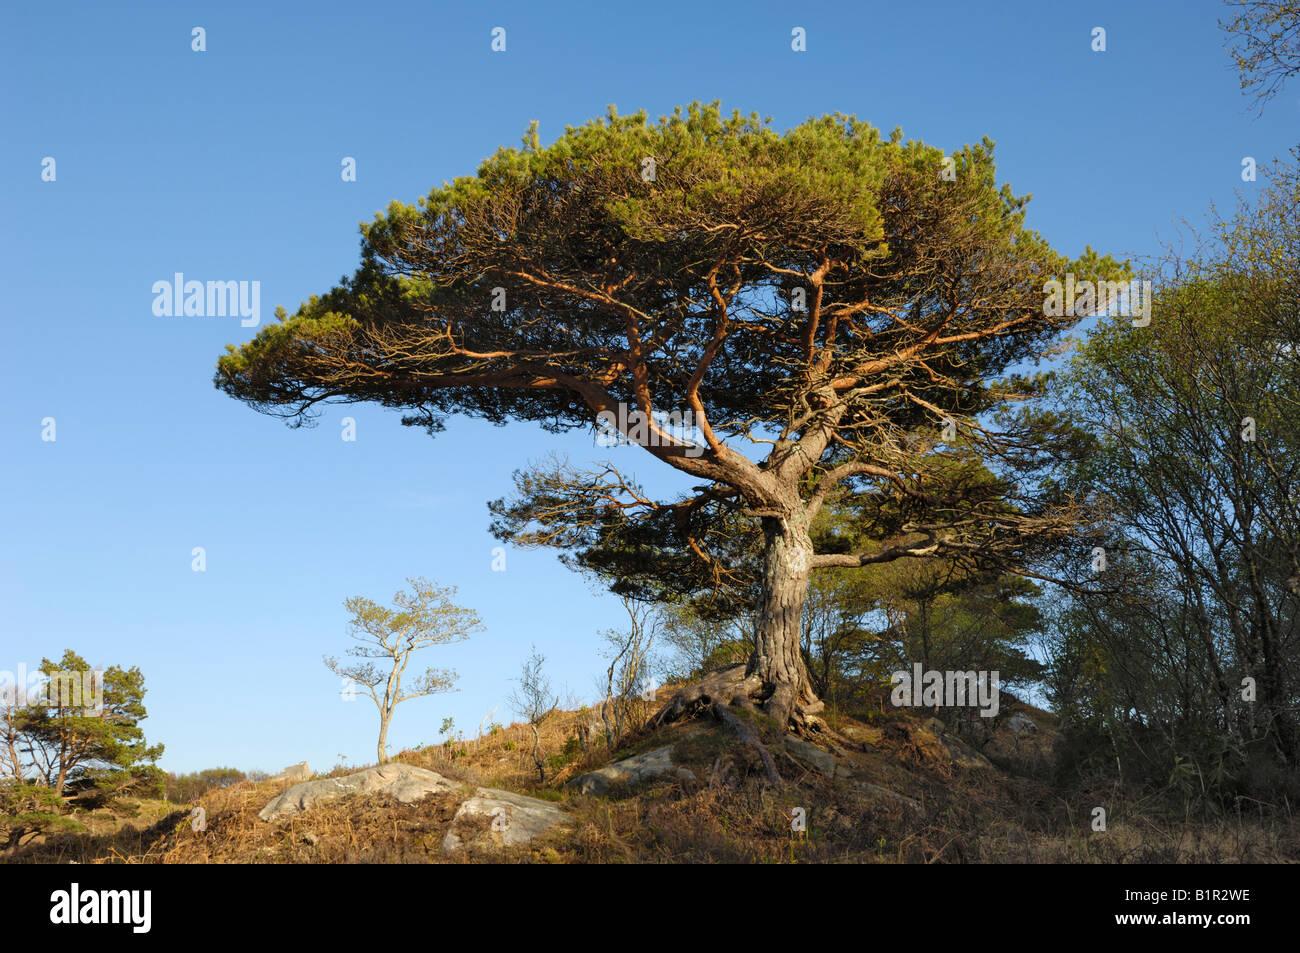 Scots Pine tree, Pinus sylvestris - Stock Image